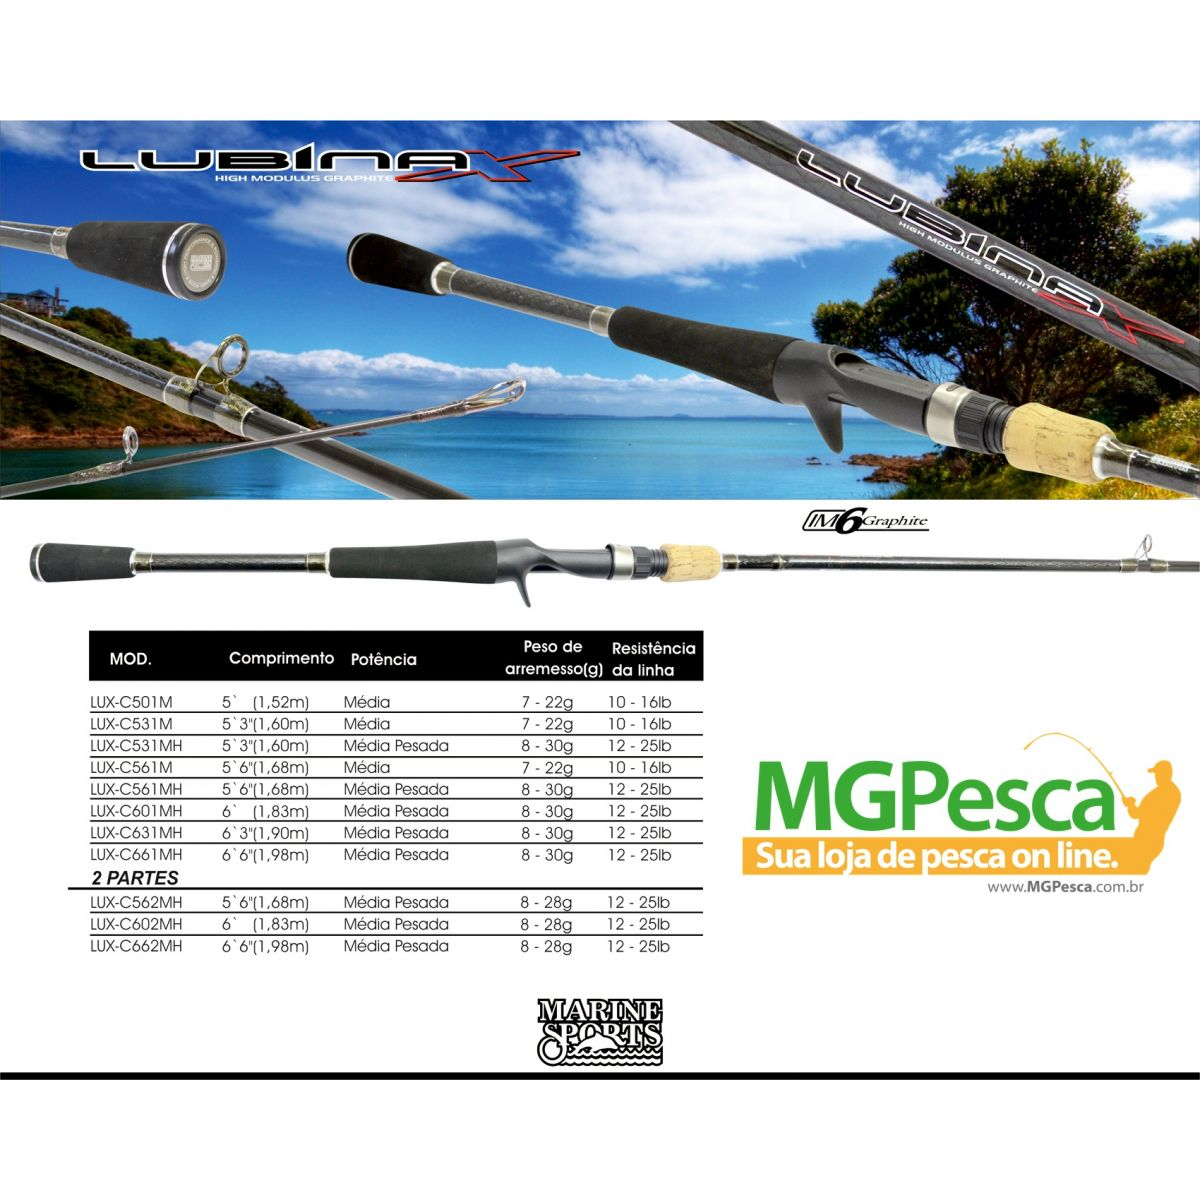 "Vara Marine Sports Lubina X 6"" (1,83m) 25lbs - LUX-C601MH  - MGPesca"